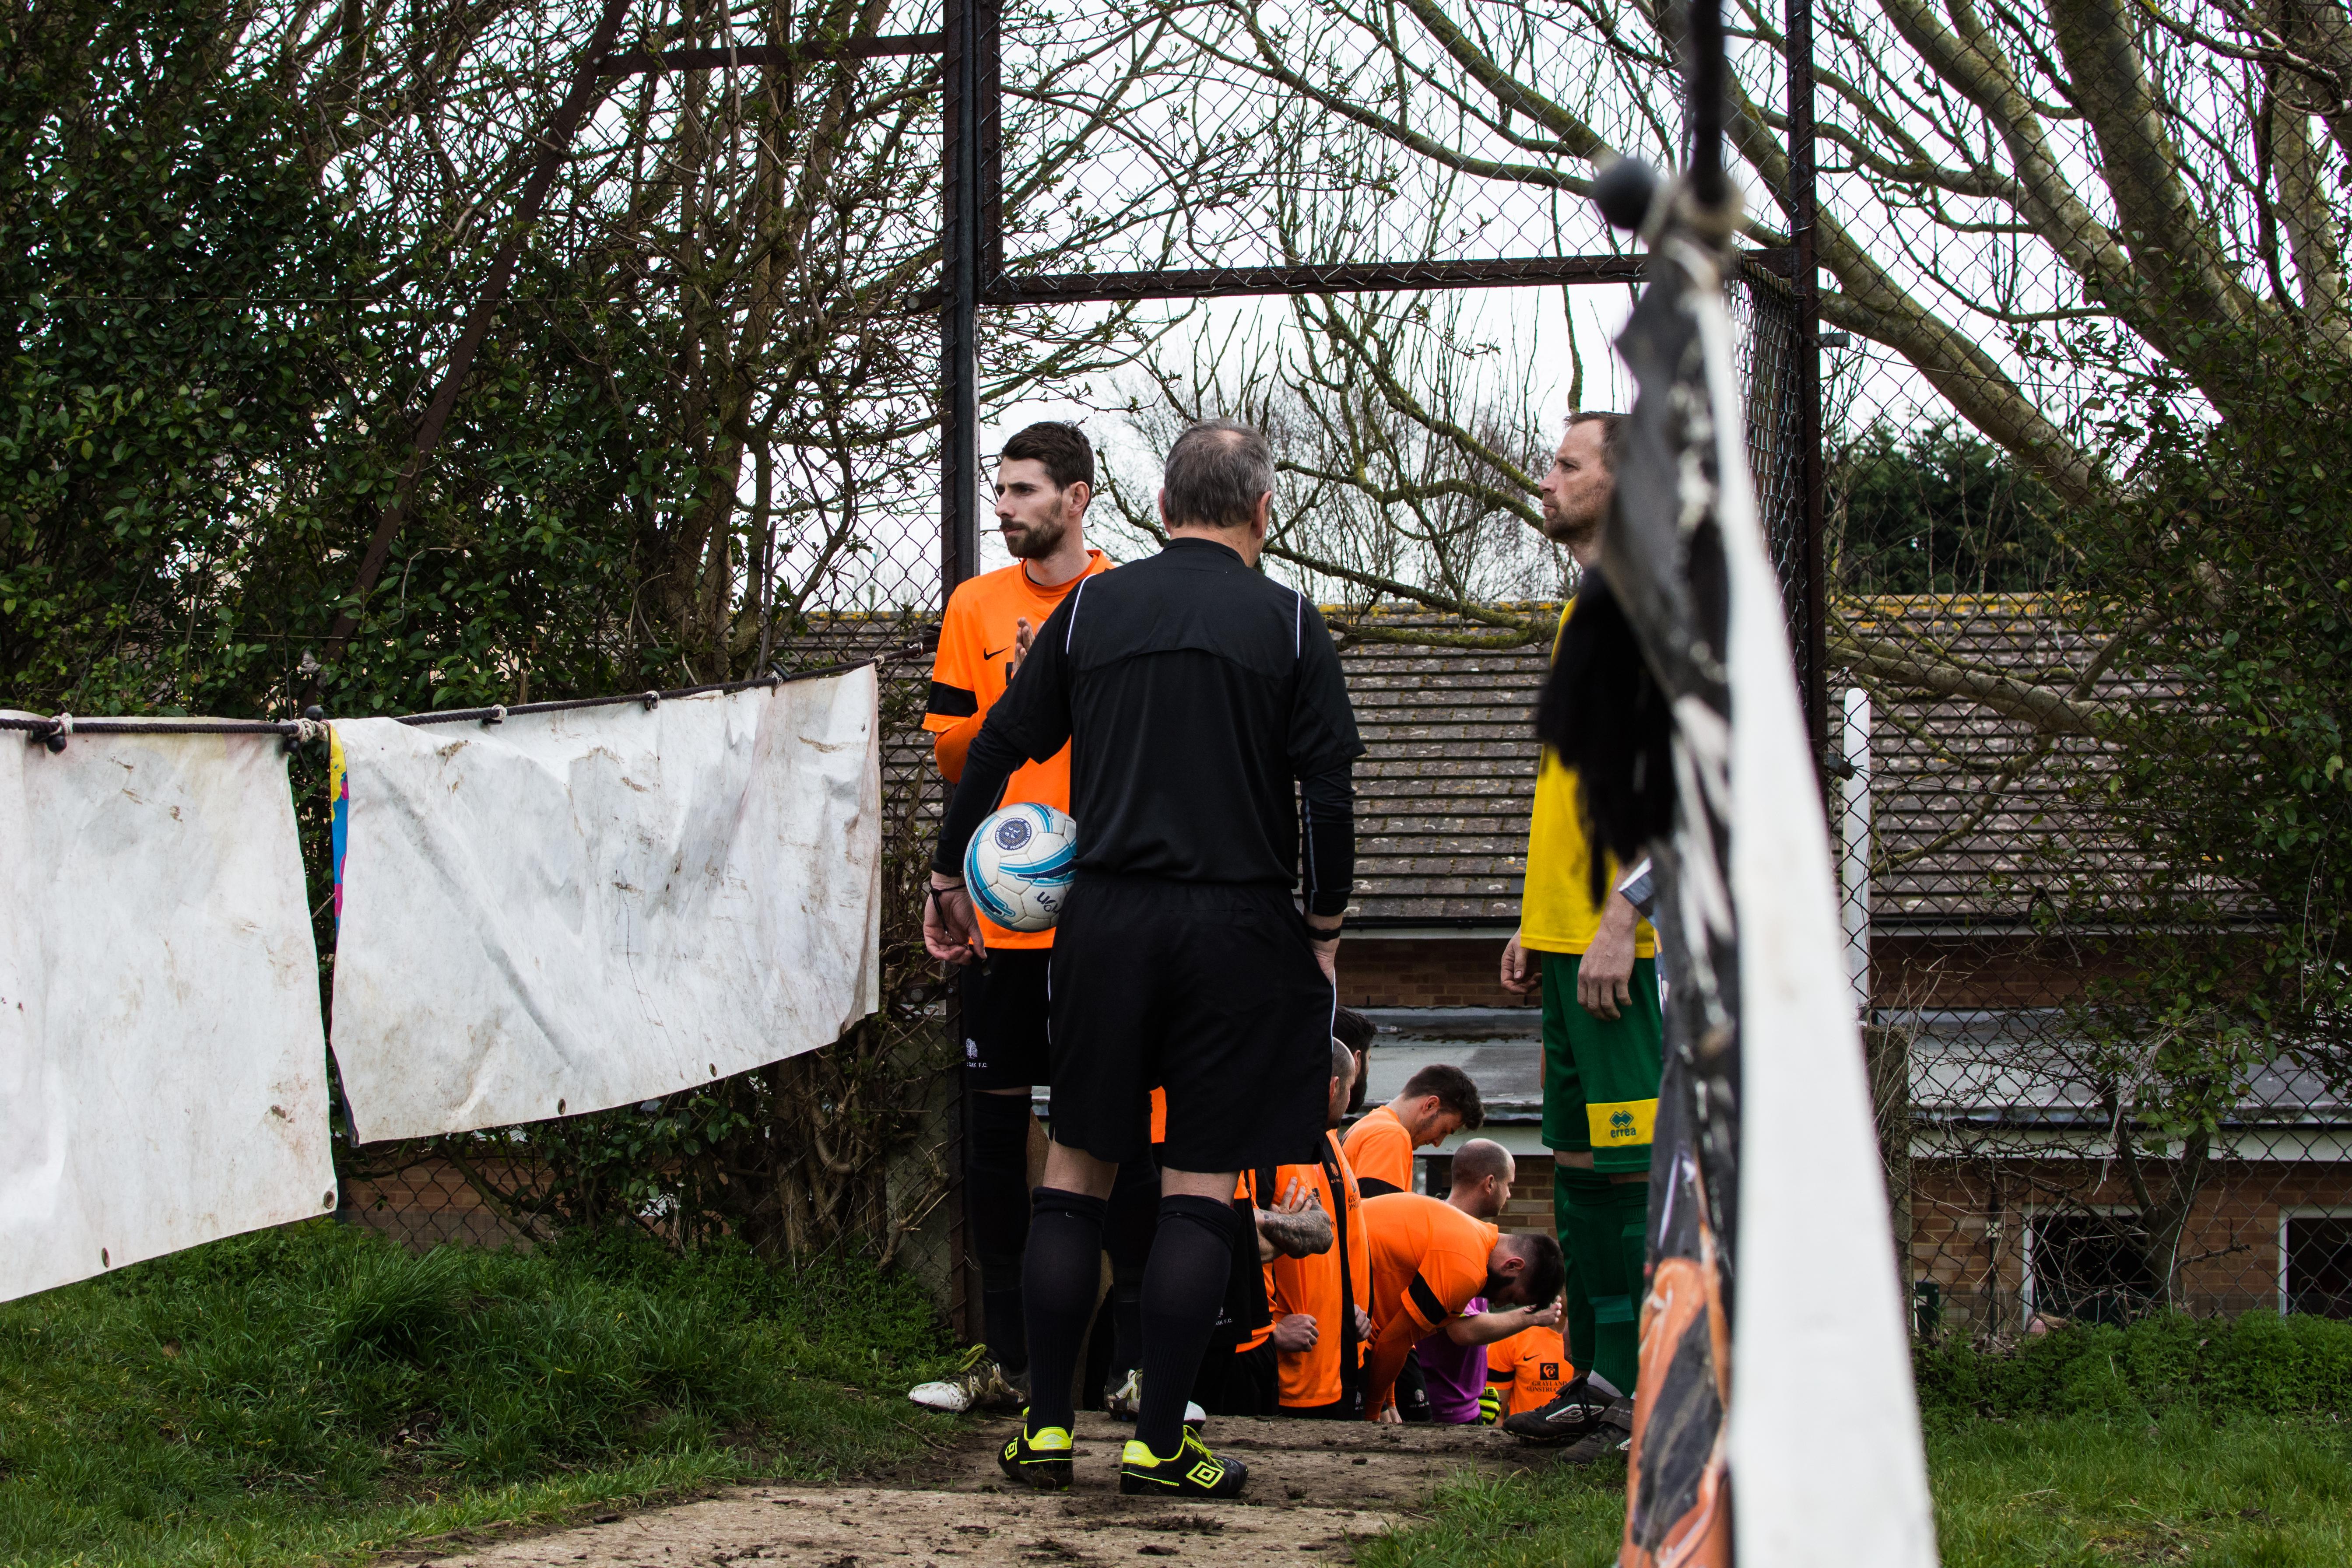 DAVID_JEFFERY Mile Oak FC vs Hailsham Town FC 24.03.18 03